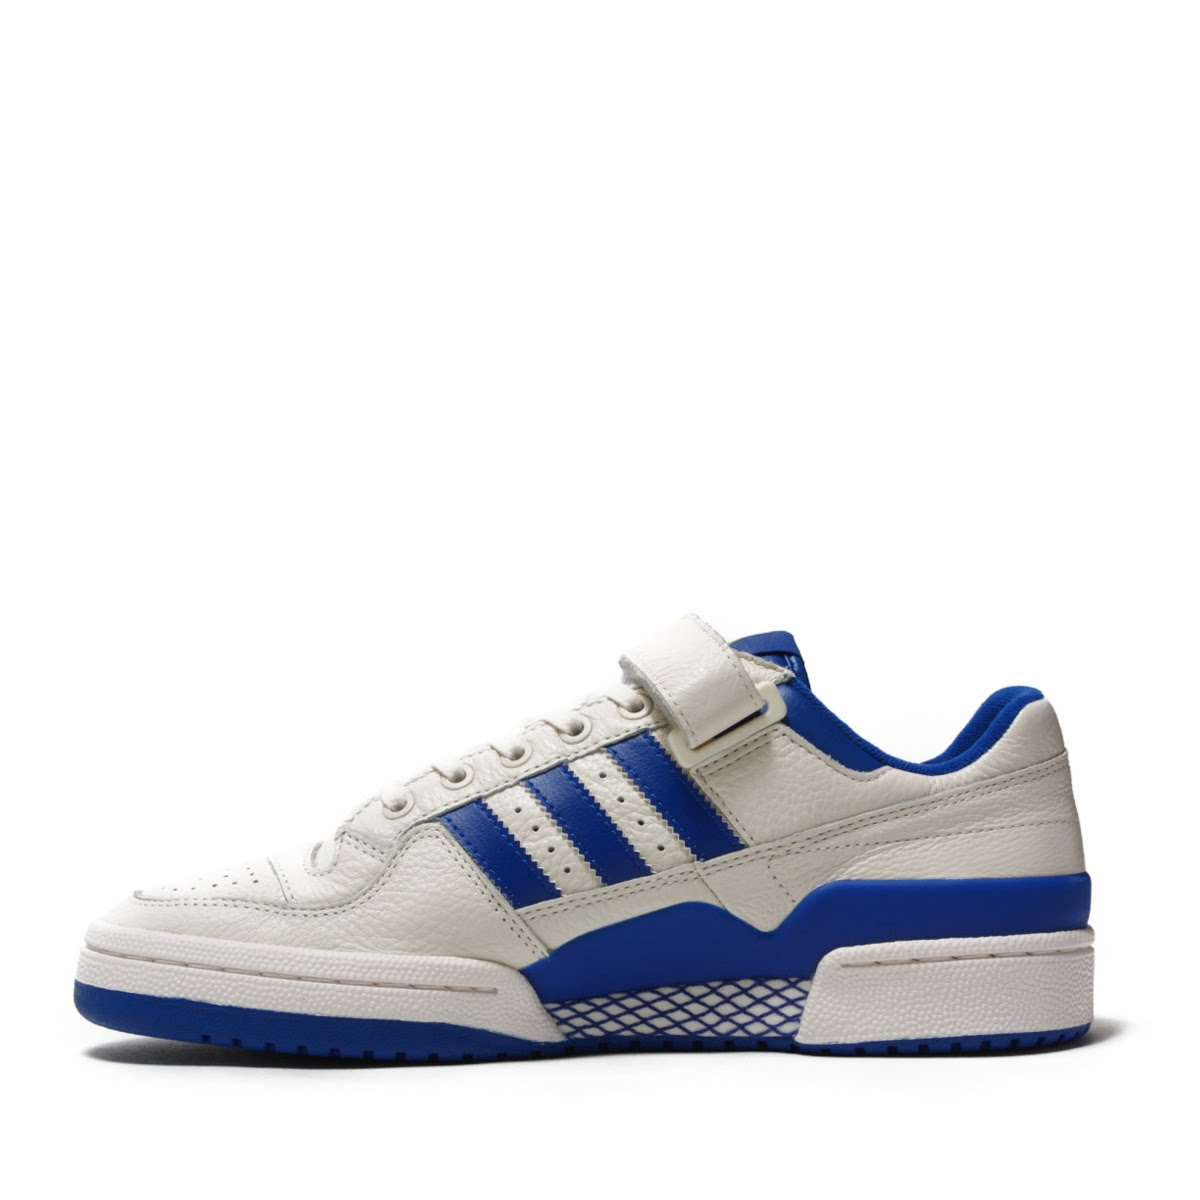 adidas Originals FORUM LO (Adidas originals forum low) CHALK WHITECOLLEGE ROYALGOLD MET 18FA I